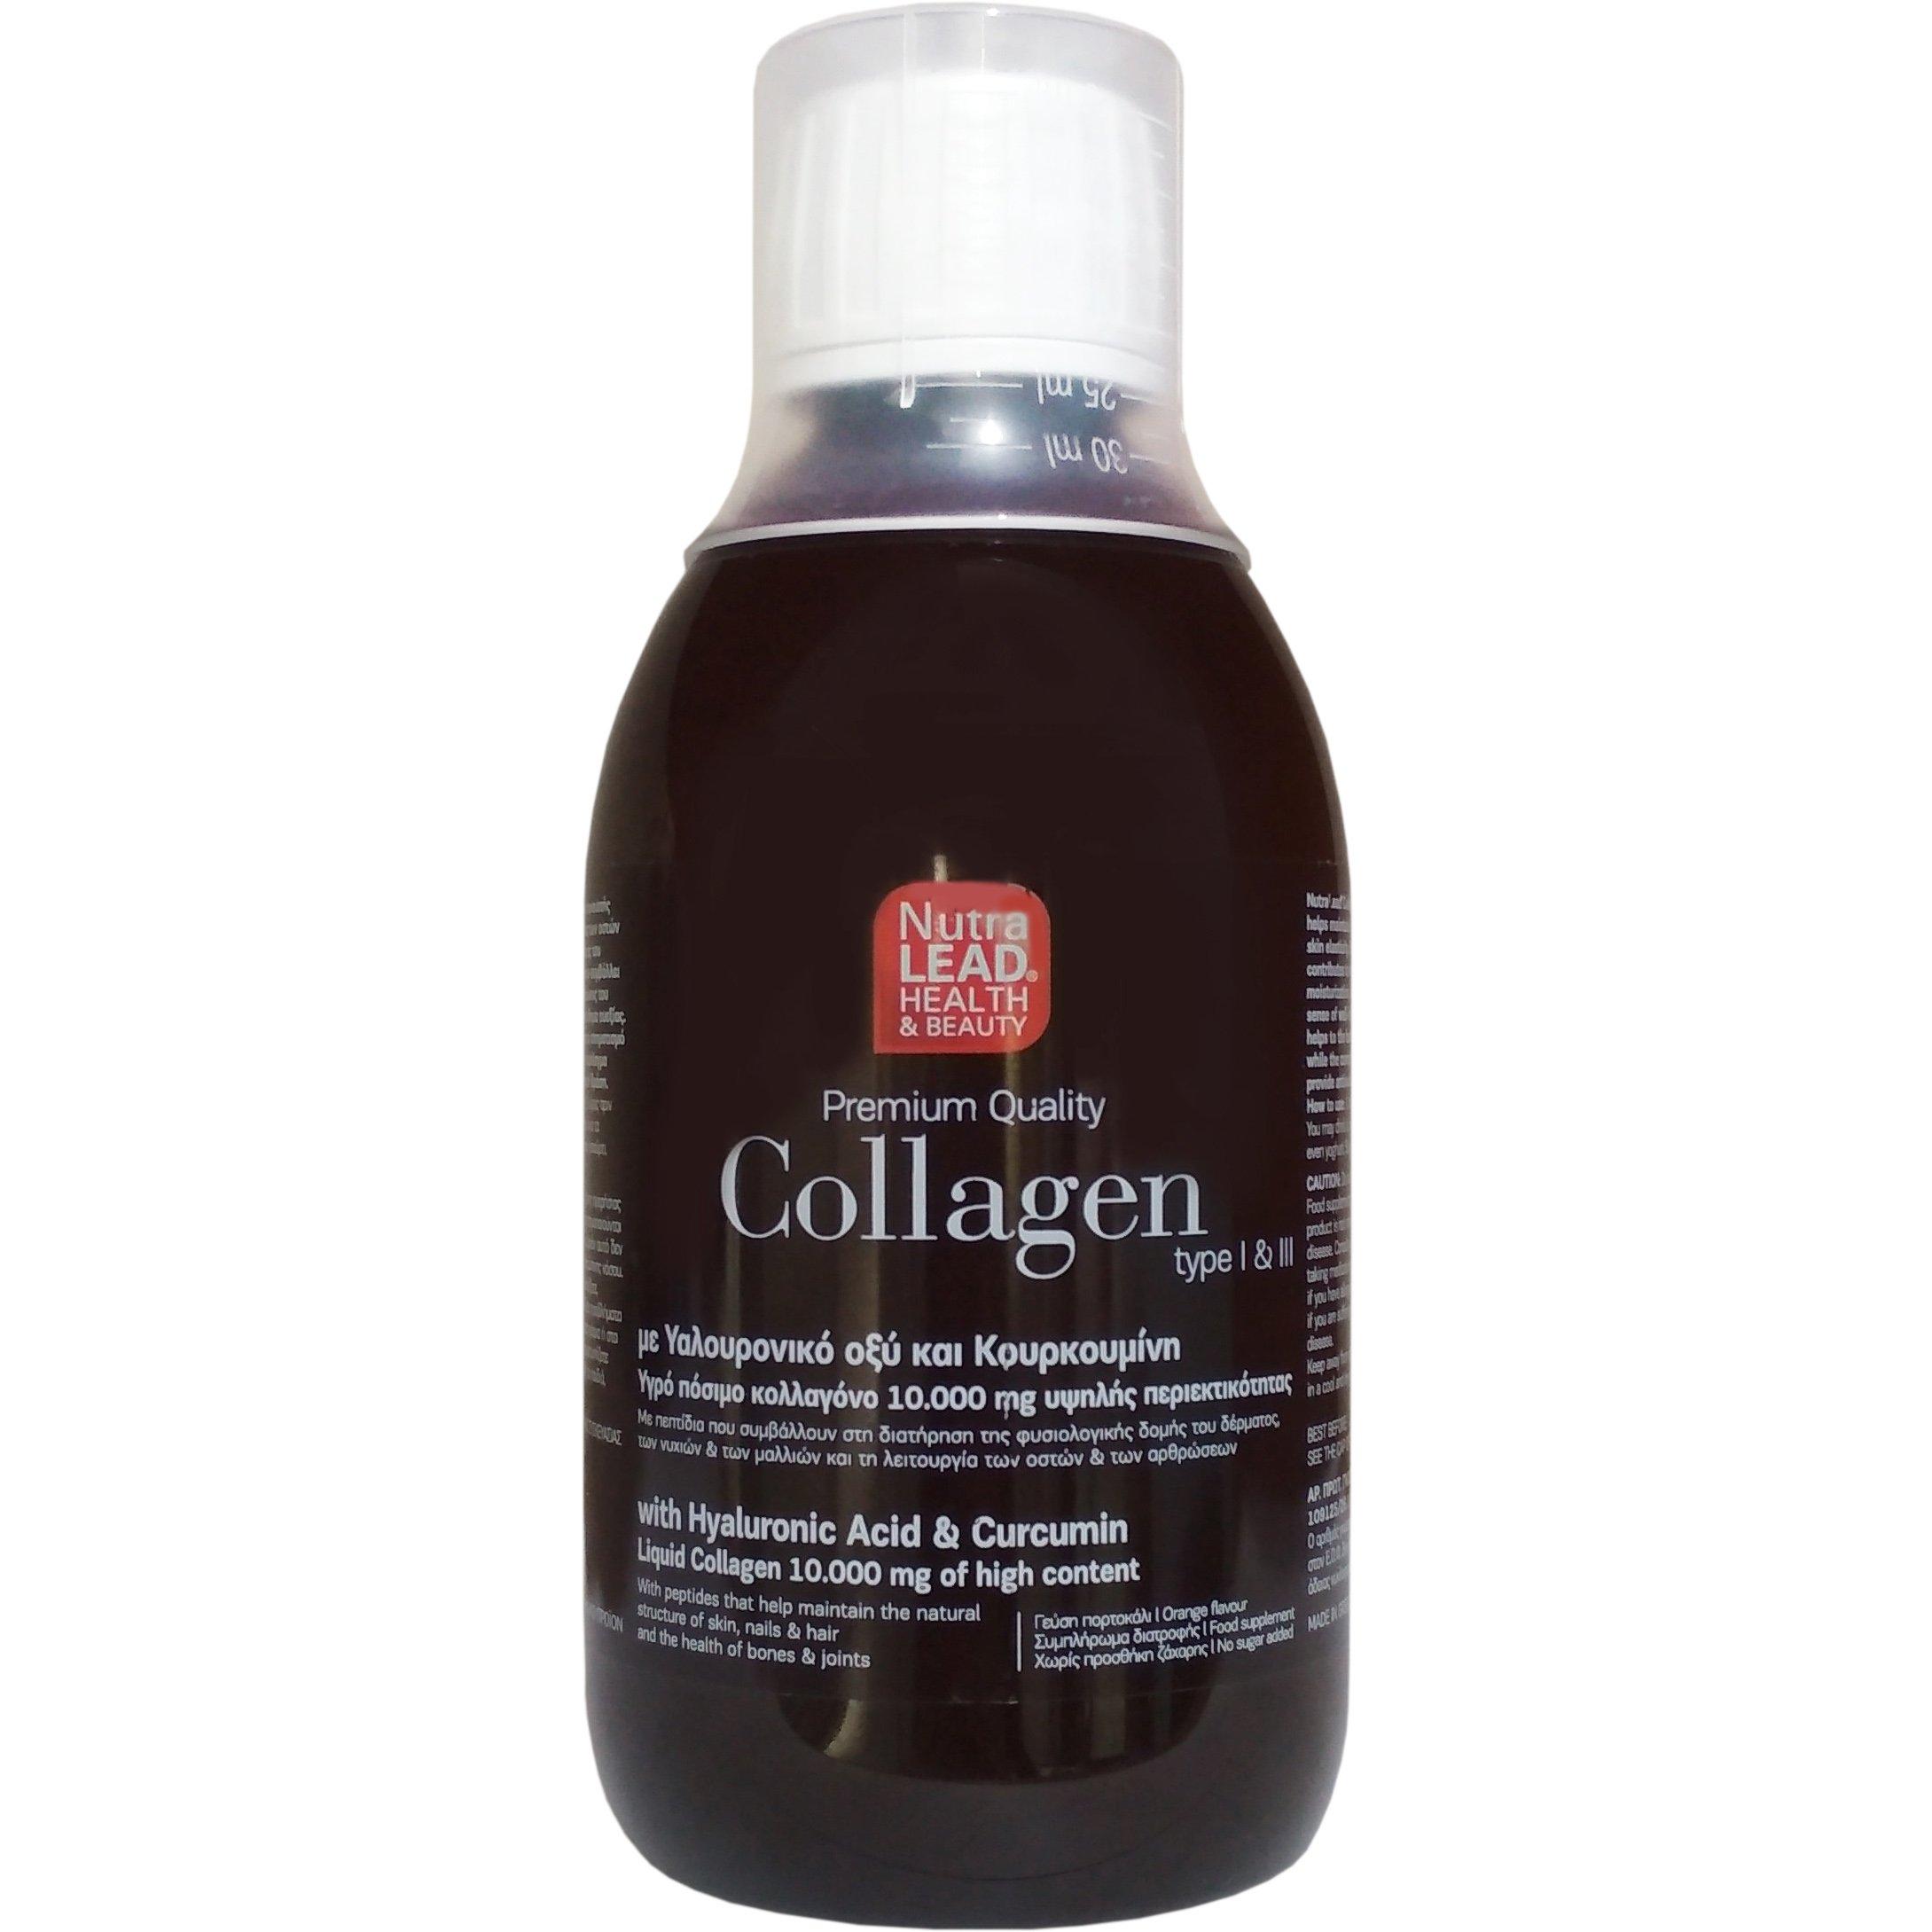 Nutralead Collagen Πόσιμο Κολλαγόνο Με Ρόδι, Ενισχυμένο με Υαλουρονικό Οξύ & Κουρκουμίνη 300ml